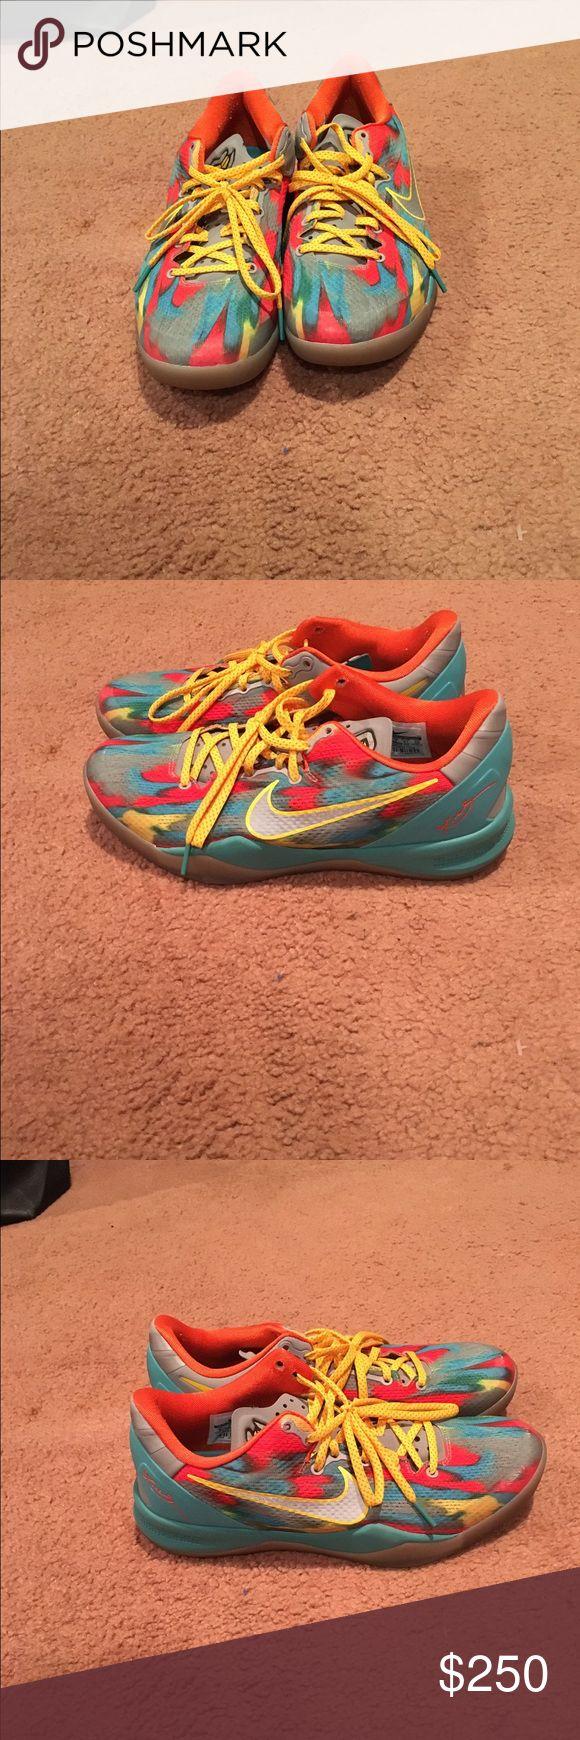 Buy Cheap Nike Kobe 8 System MC Mambacurial Cheap sale Yellow Bl